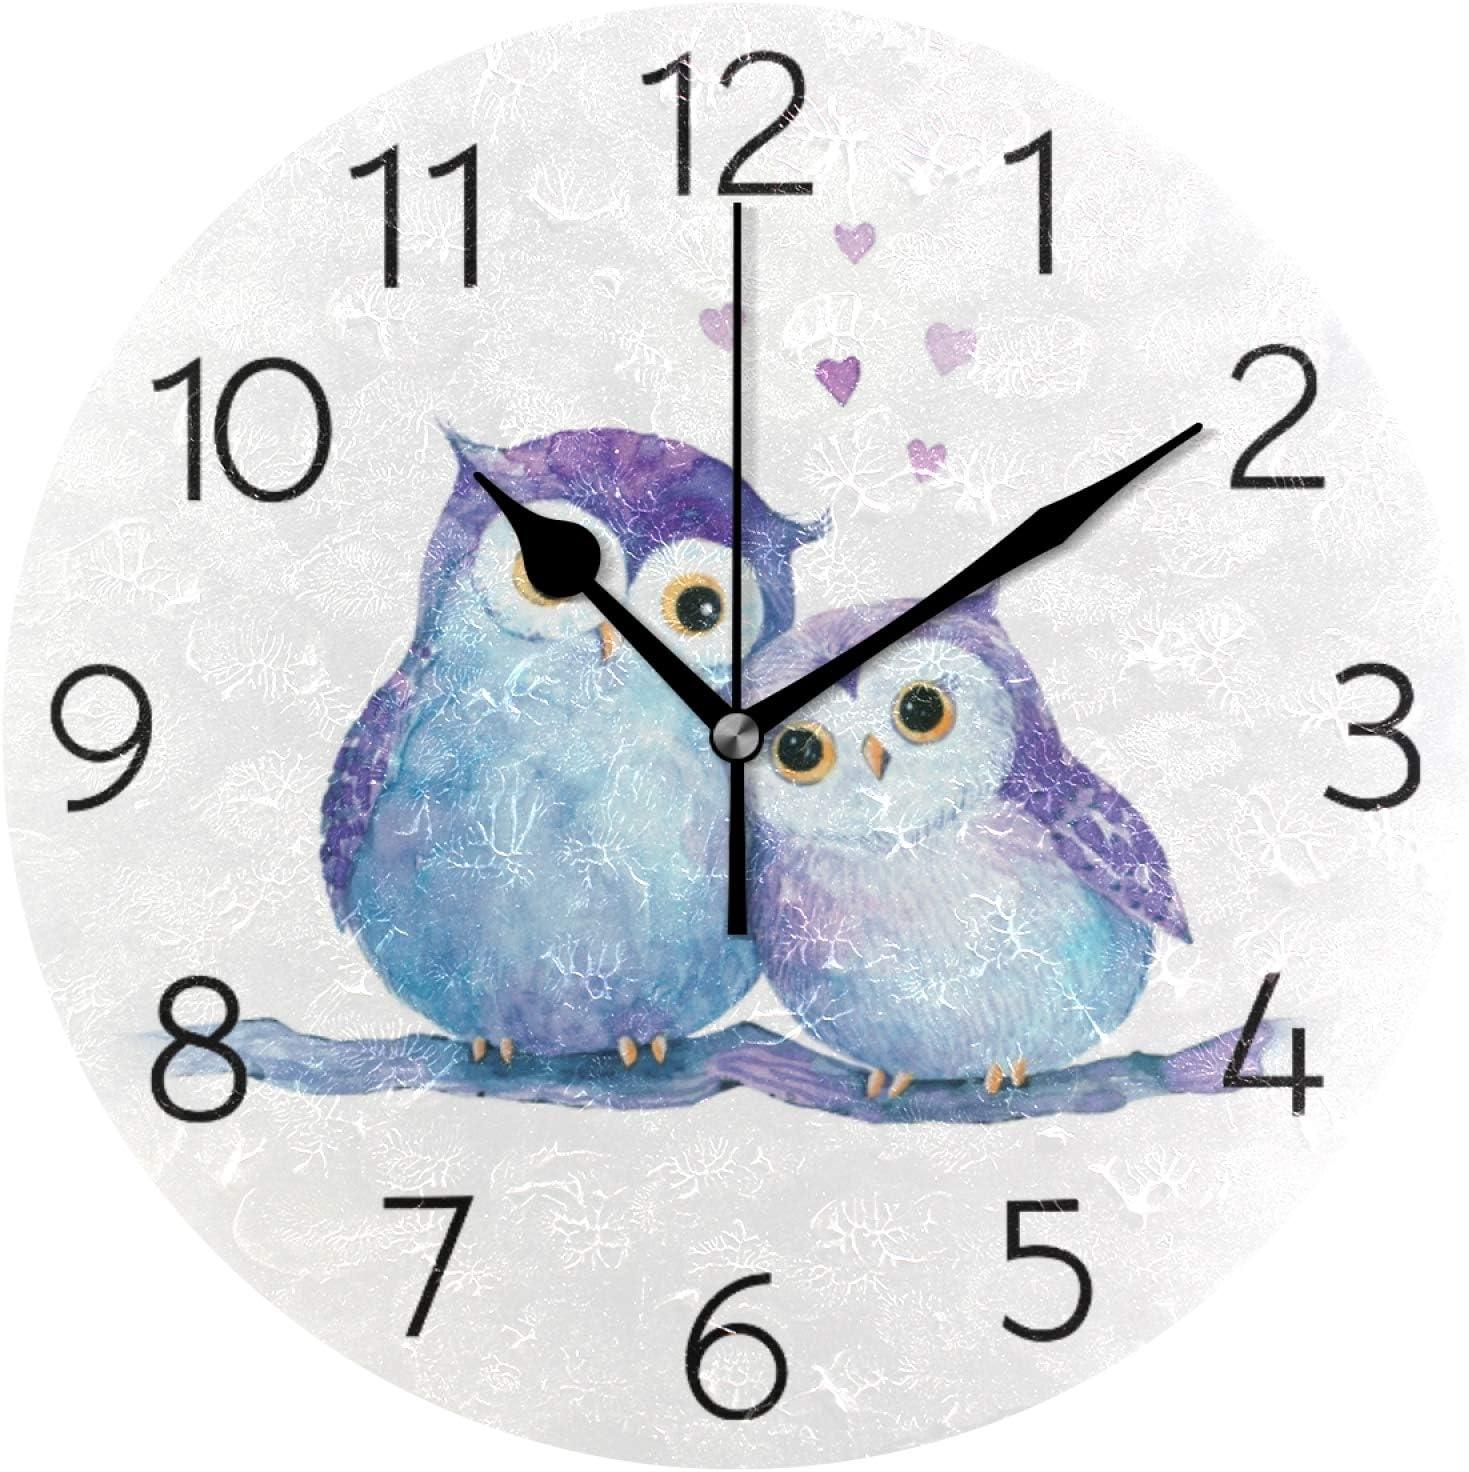 Biekaya Cute Owls Round Wall Clock Hanging Quiet Battery Operated Modern Art Wall Clocks for Bedroom Kitchen Living Room